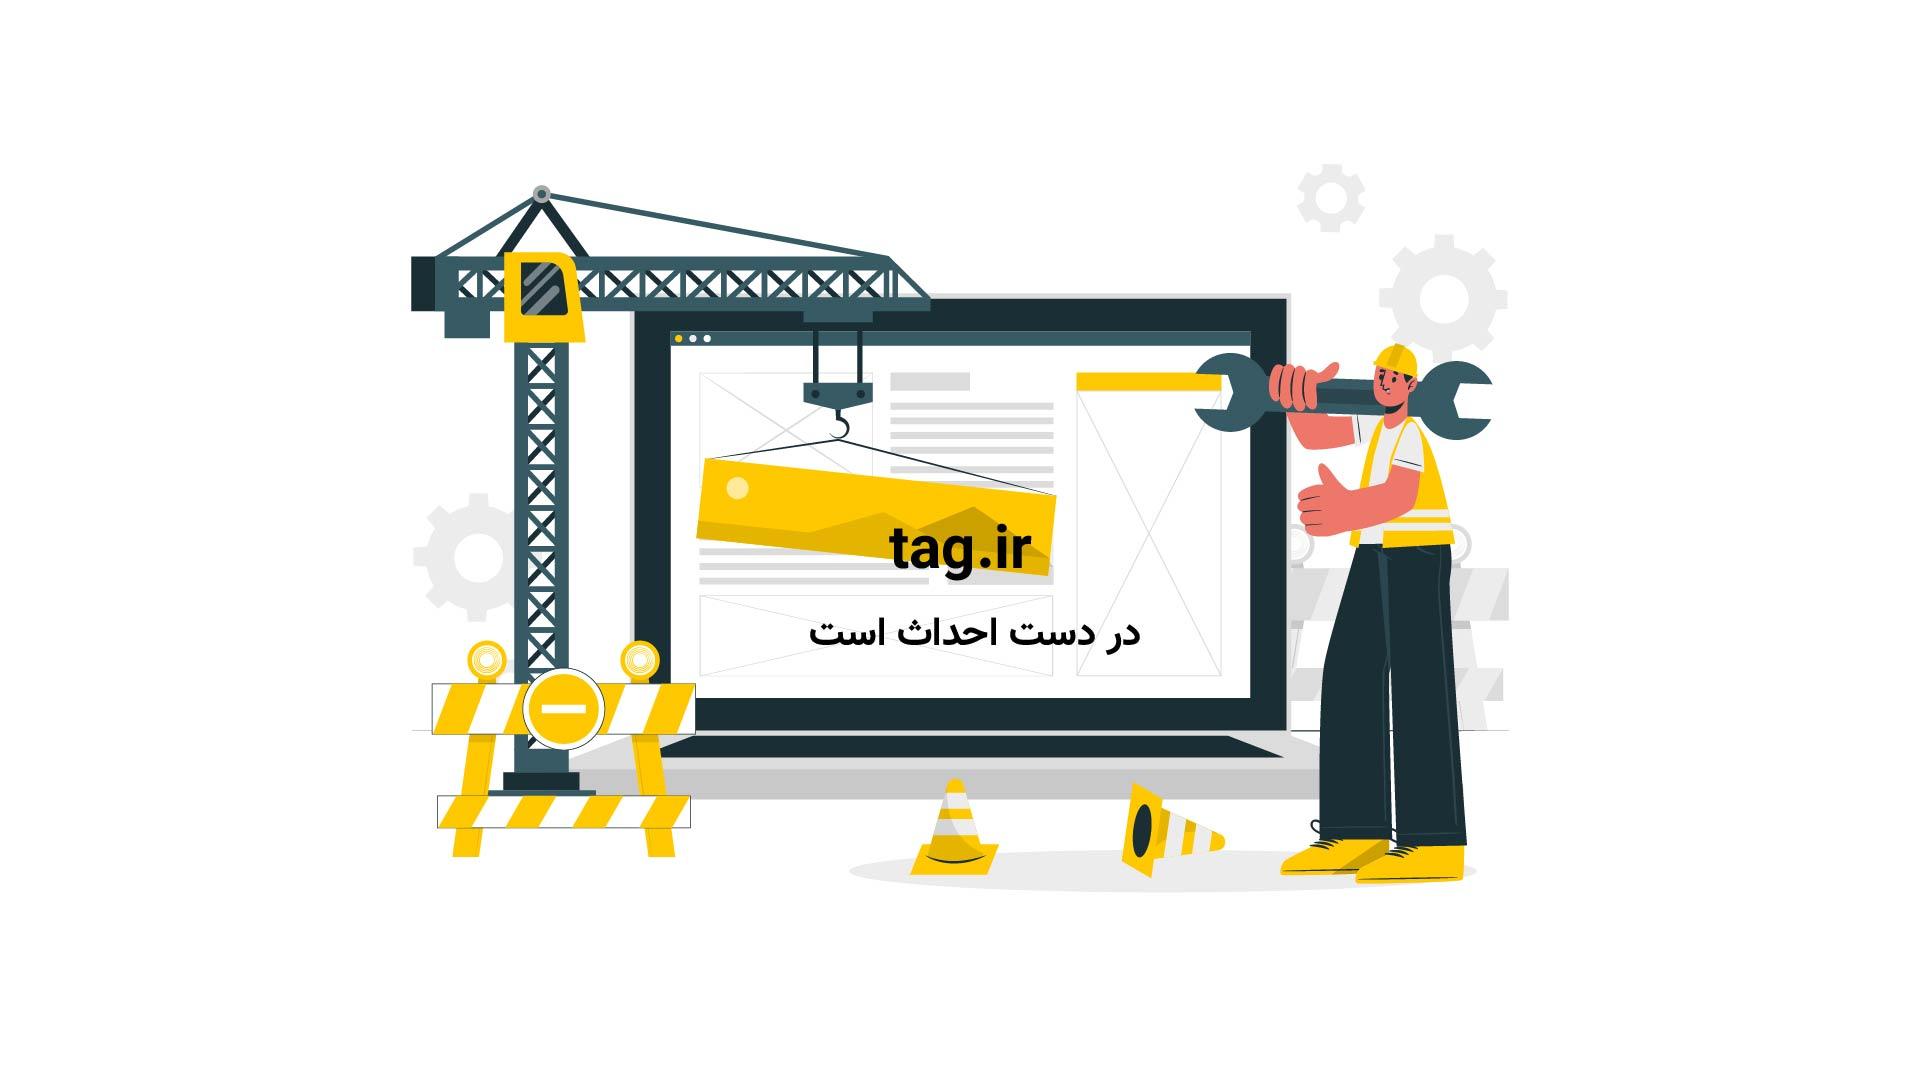 لگو بهترین بازیکن سال ۲۰۱۶ کریستیانو رونالدو | فیلم